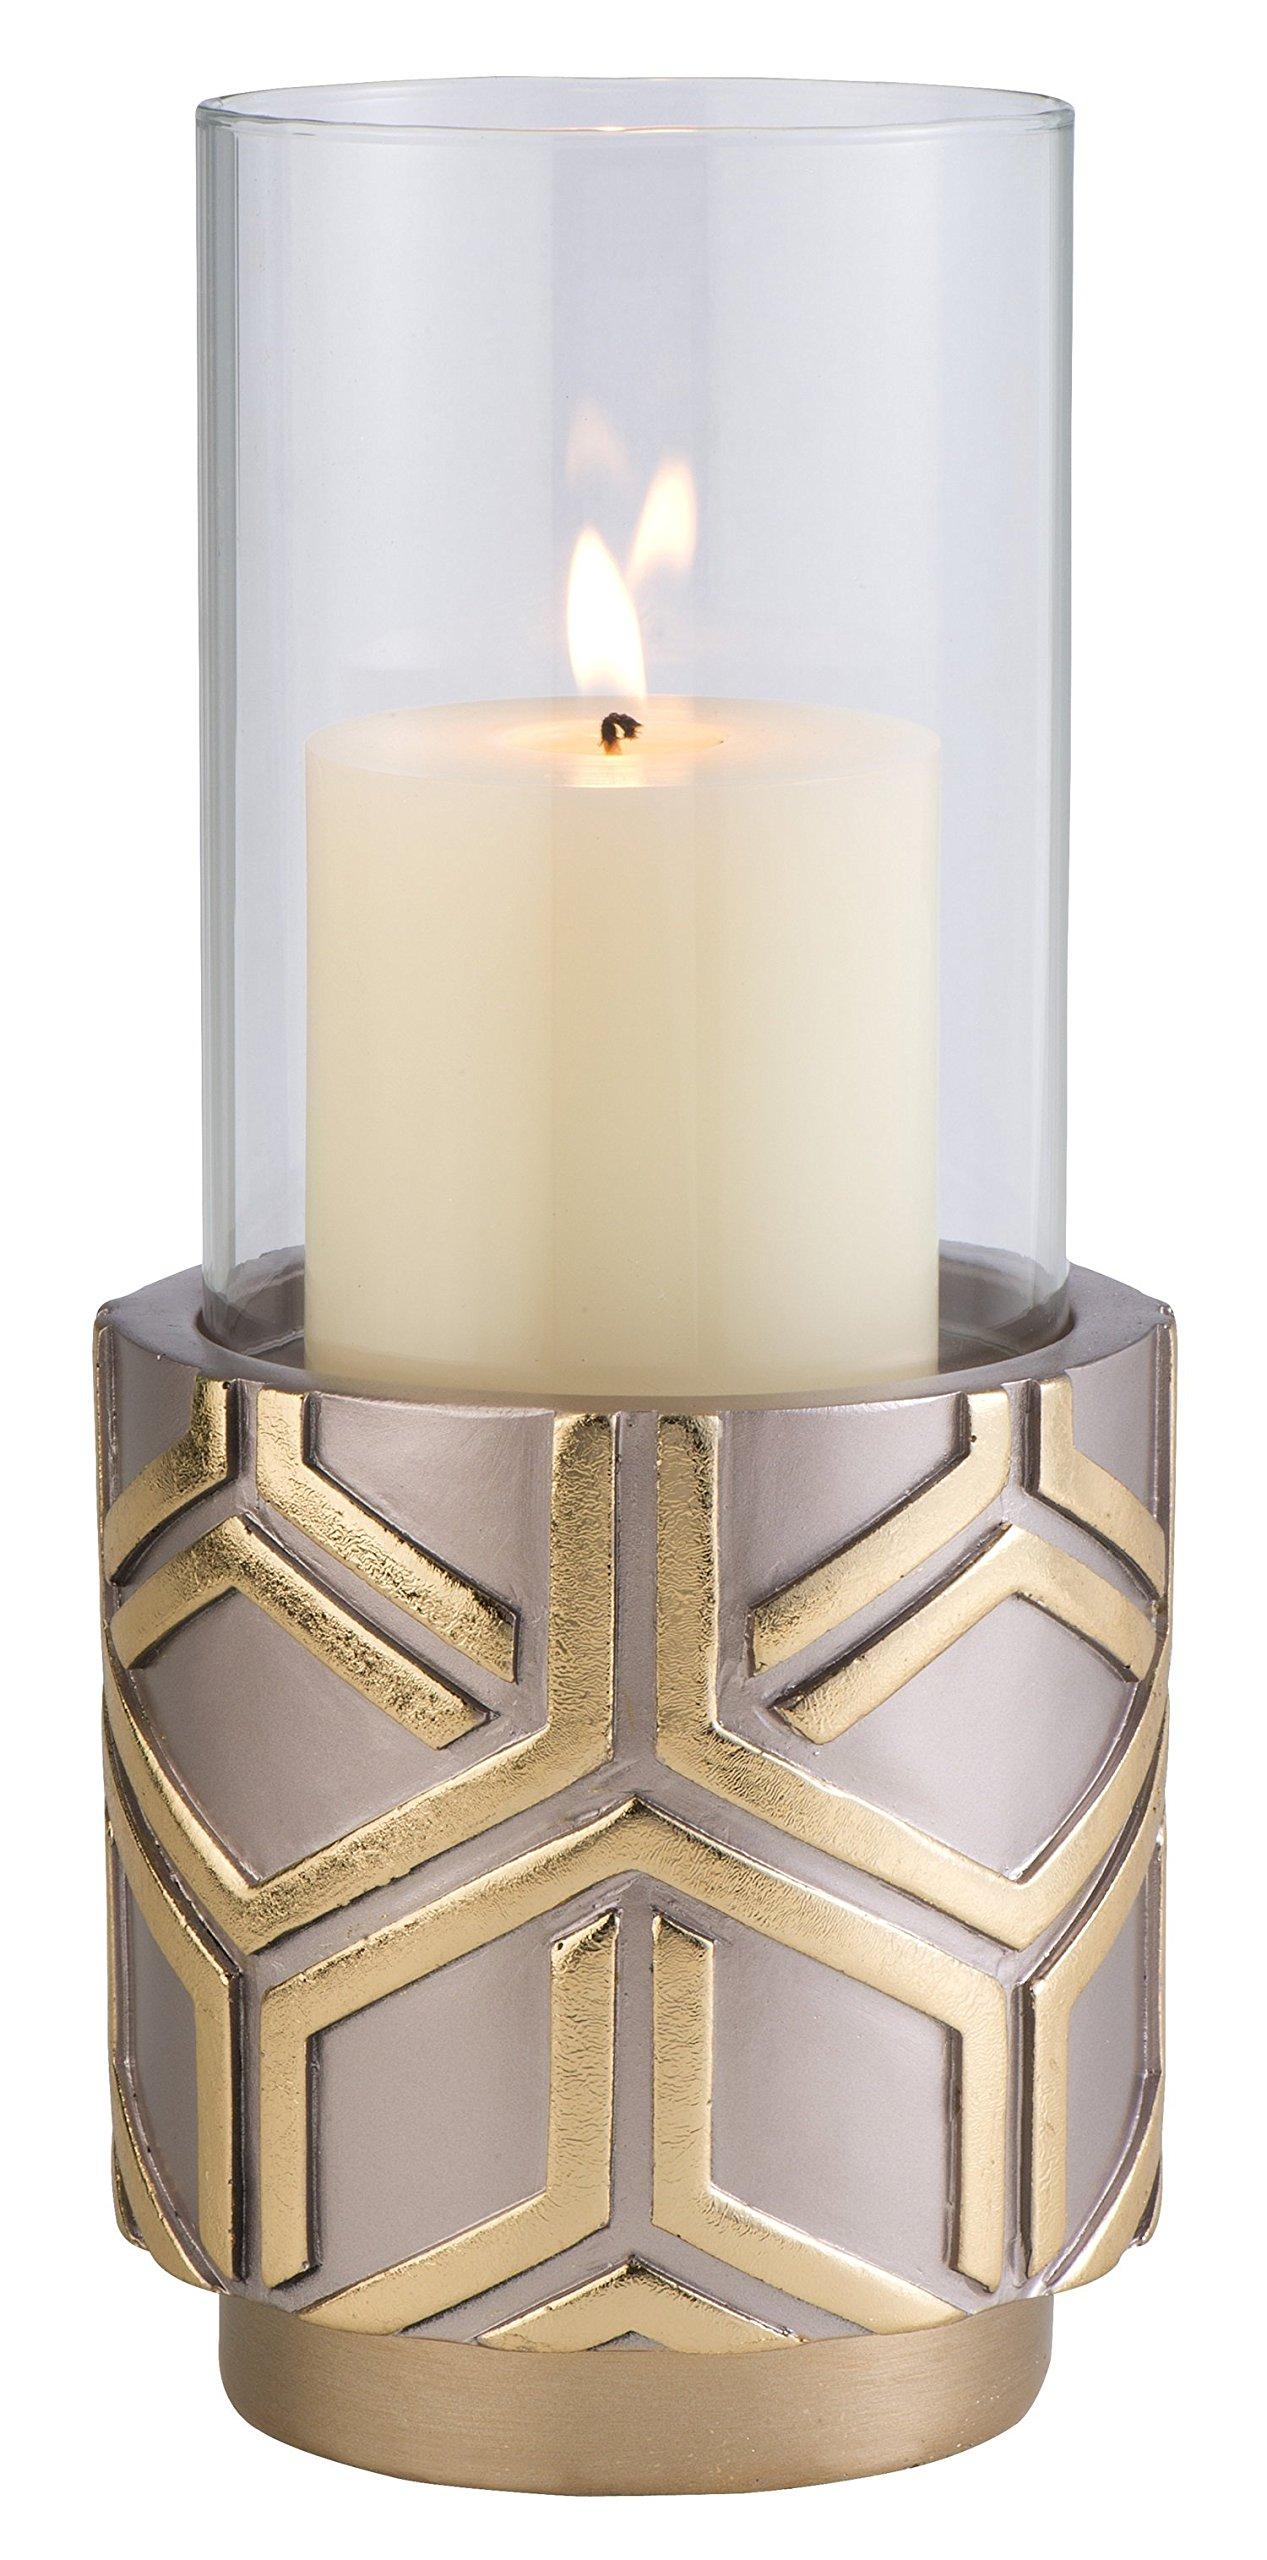 OK Lighting OK-4274-C2 11 Inch Rose Gold Color Savannah Candle Holder,